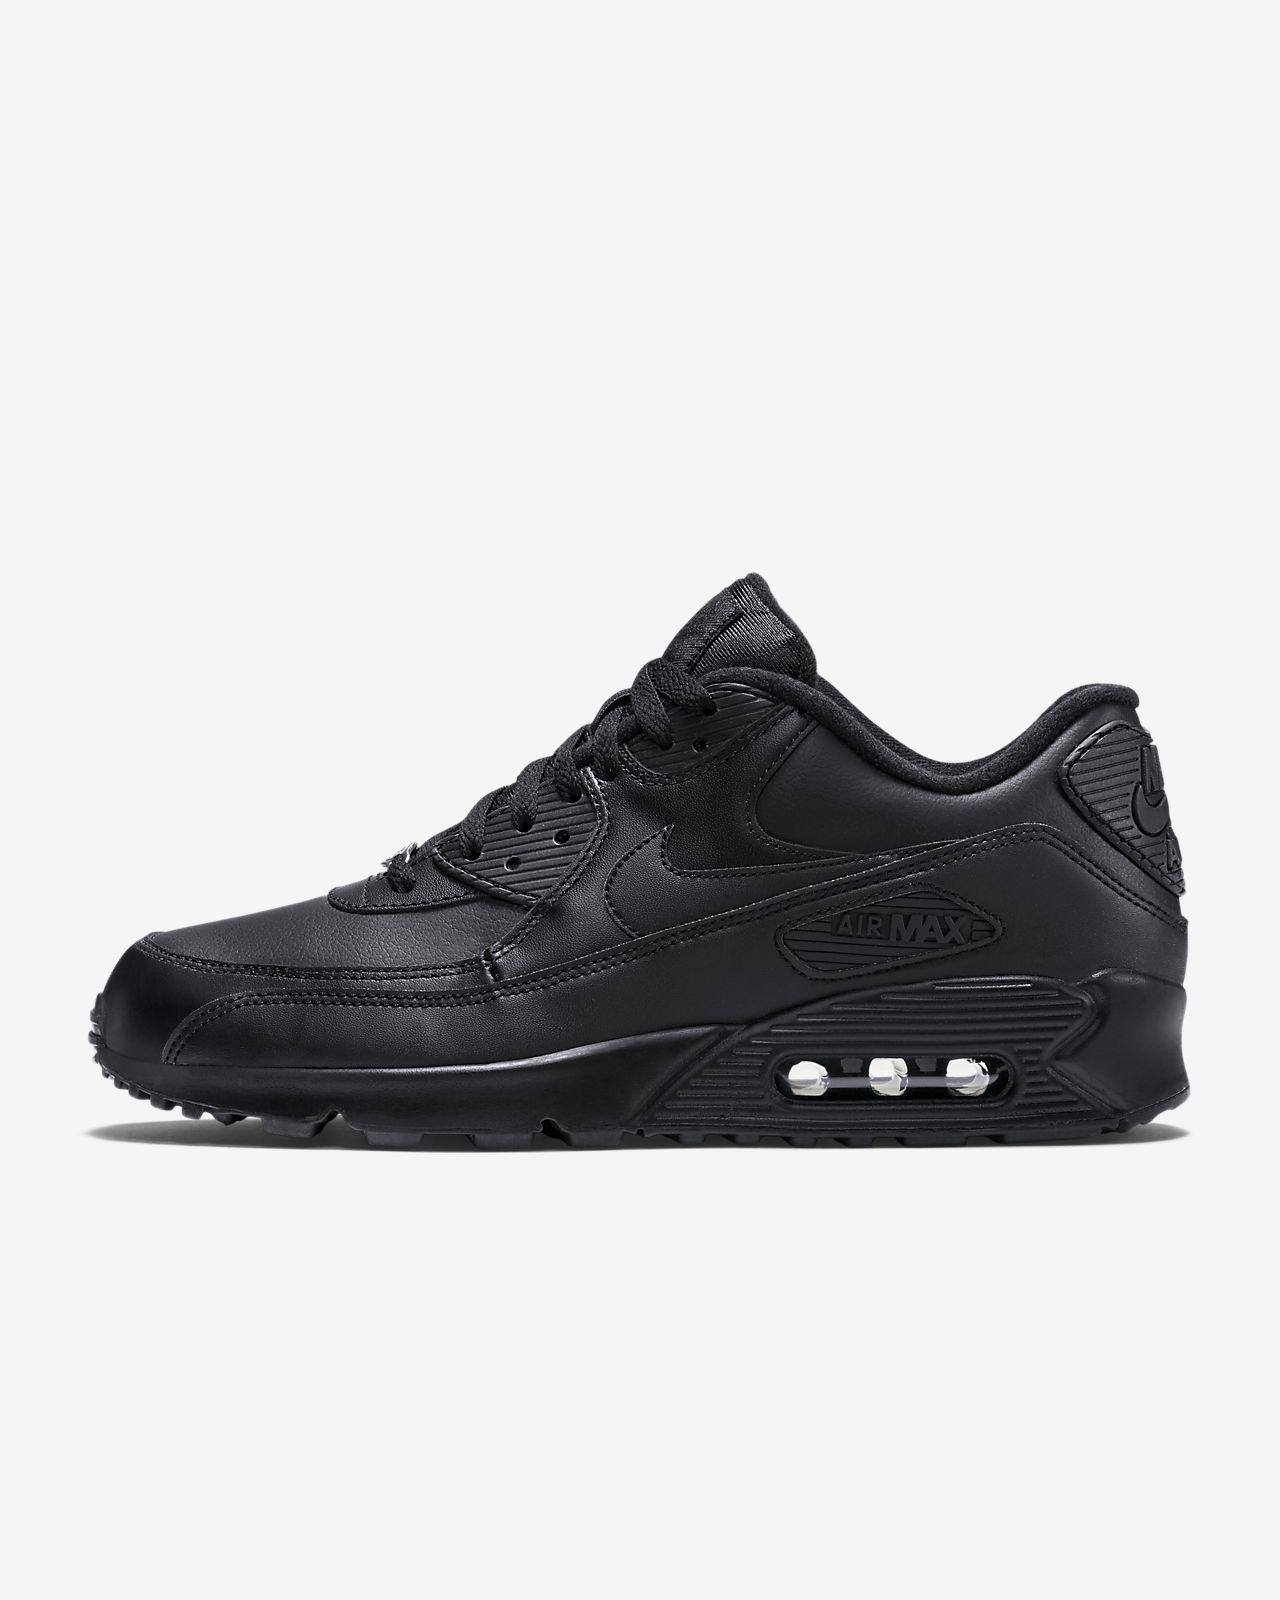 Nike Air Max 90 Leather Herrenschuh